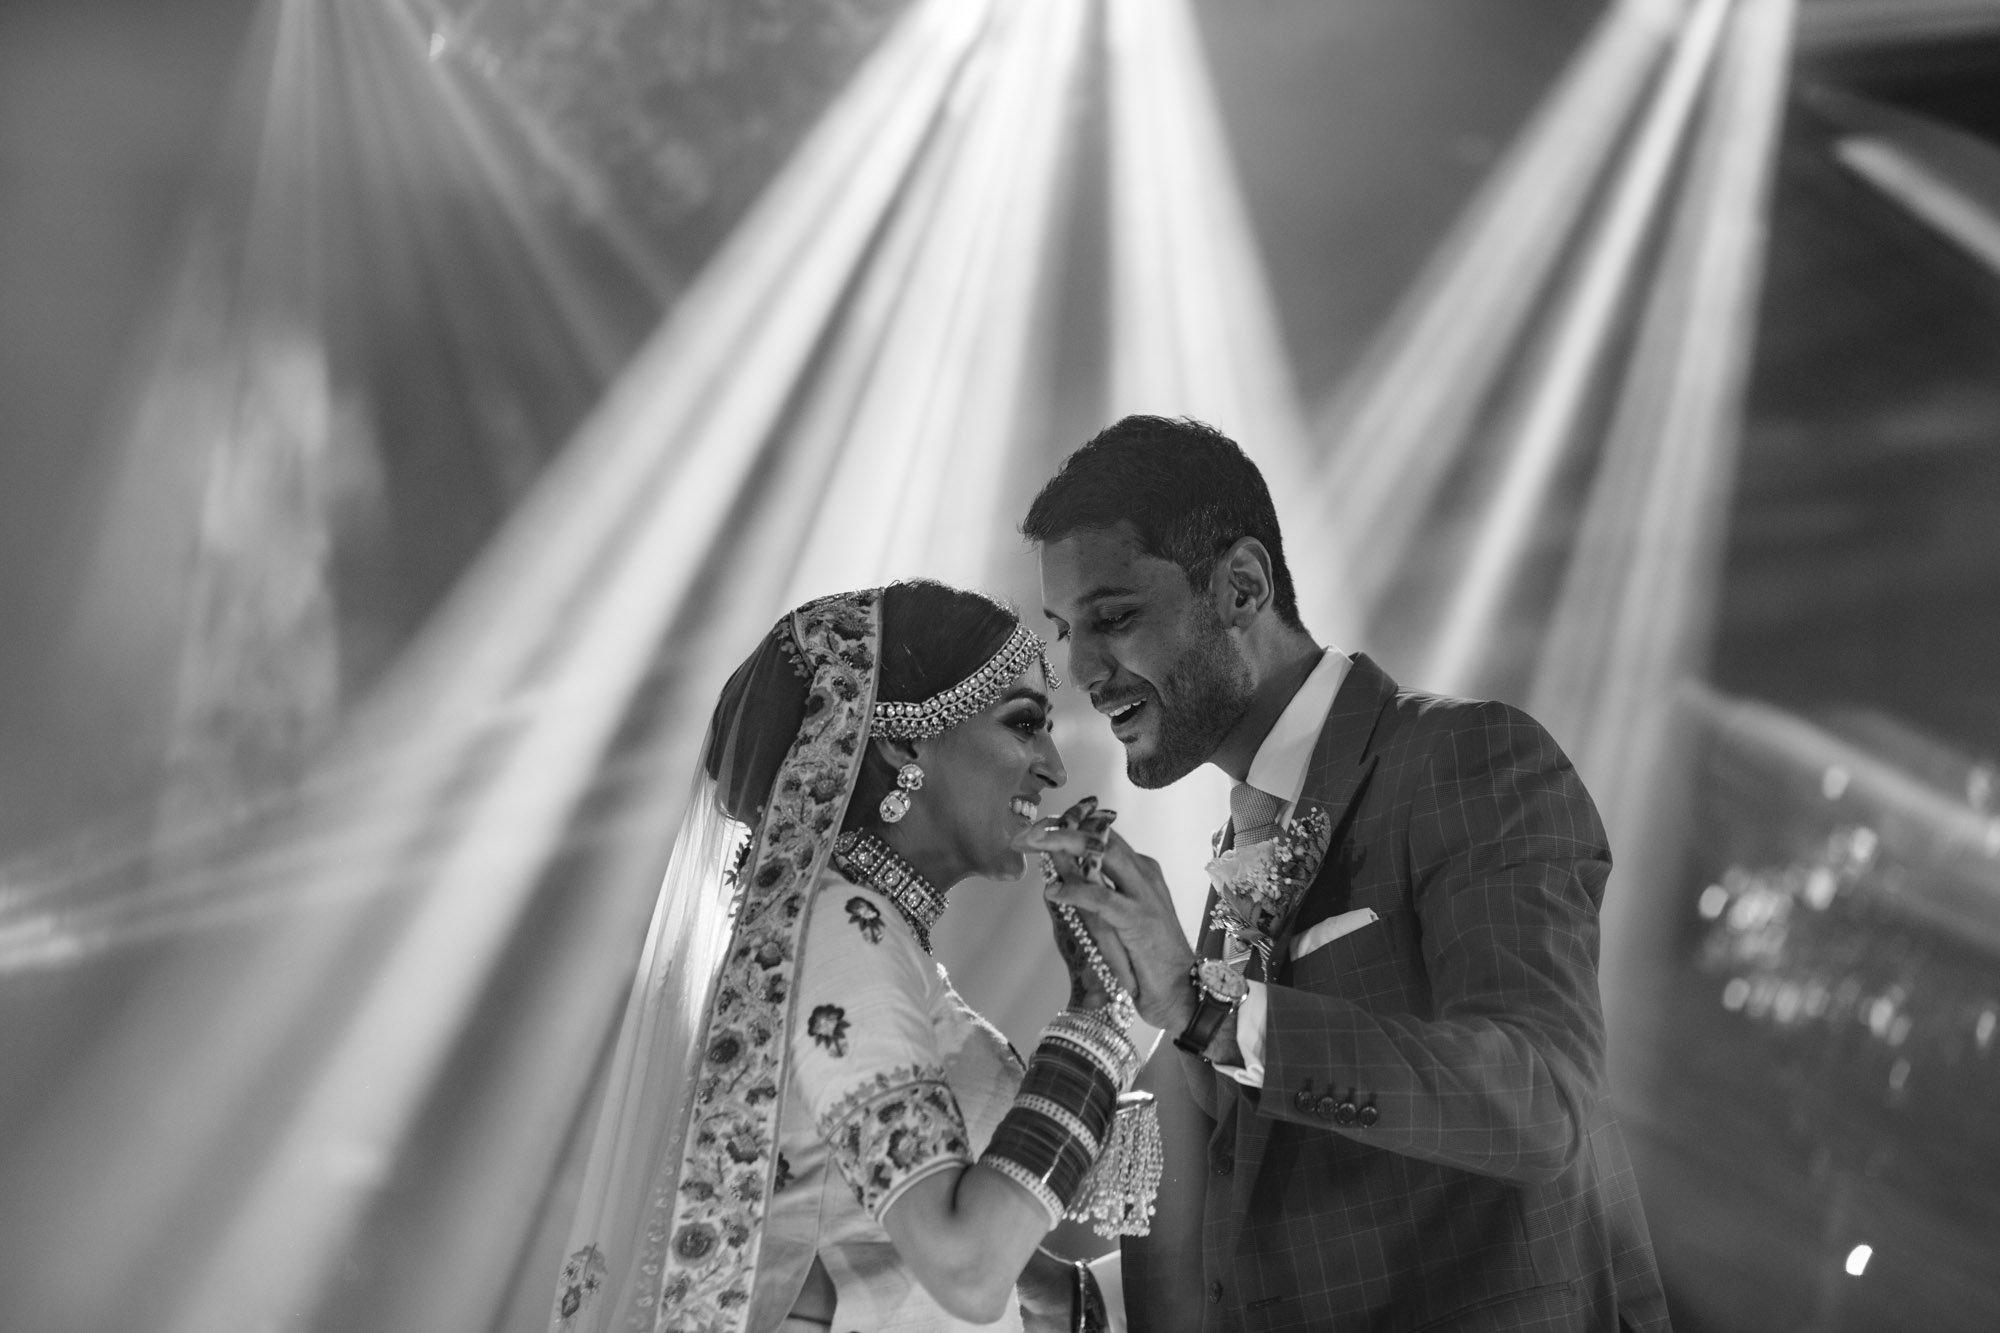 Sikh wedding photographer London, Sofitel Hotel London